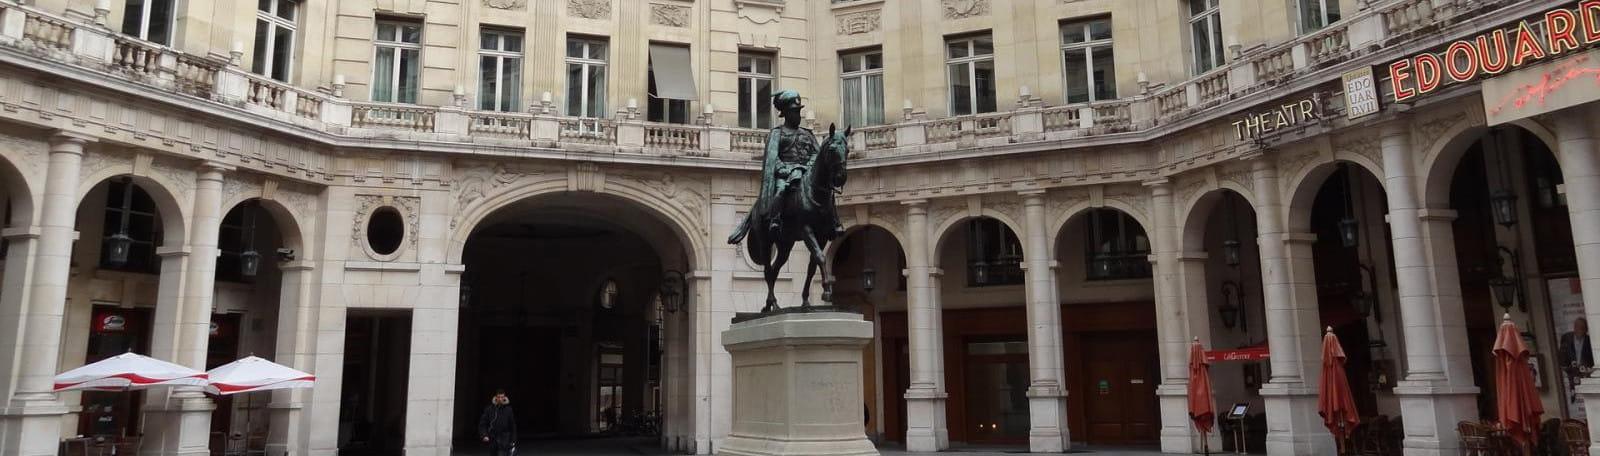 Q-Park Edouard VII - Olympia - Haussmann